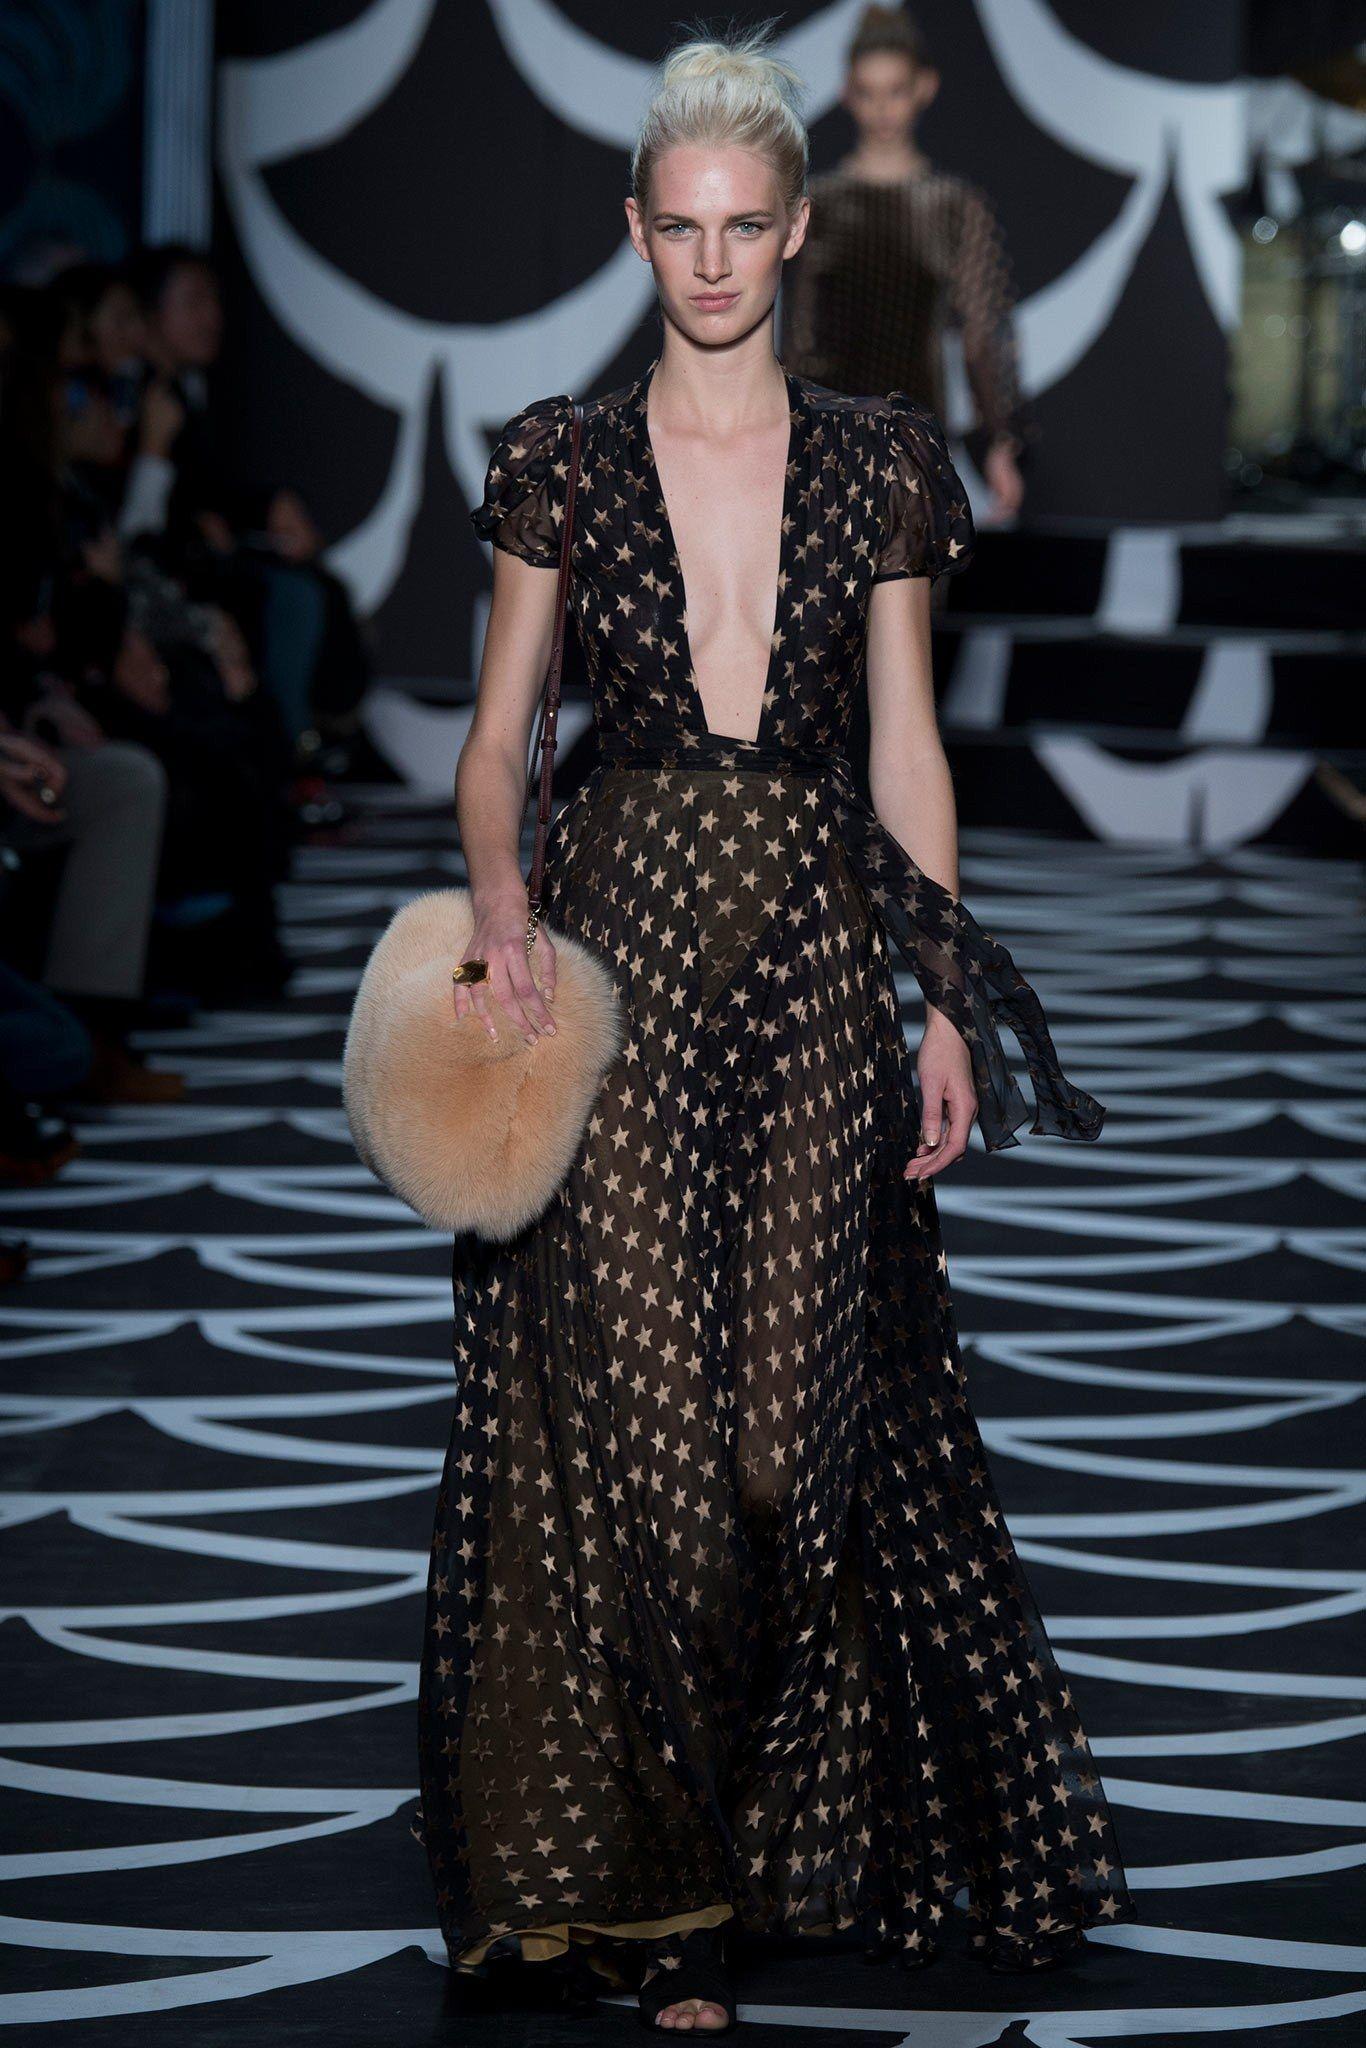 Diane von Furstenberg Fall 2014 Ready-to-Wear Fashion Show - Ashleigh Good